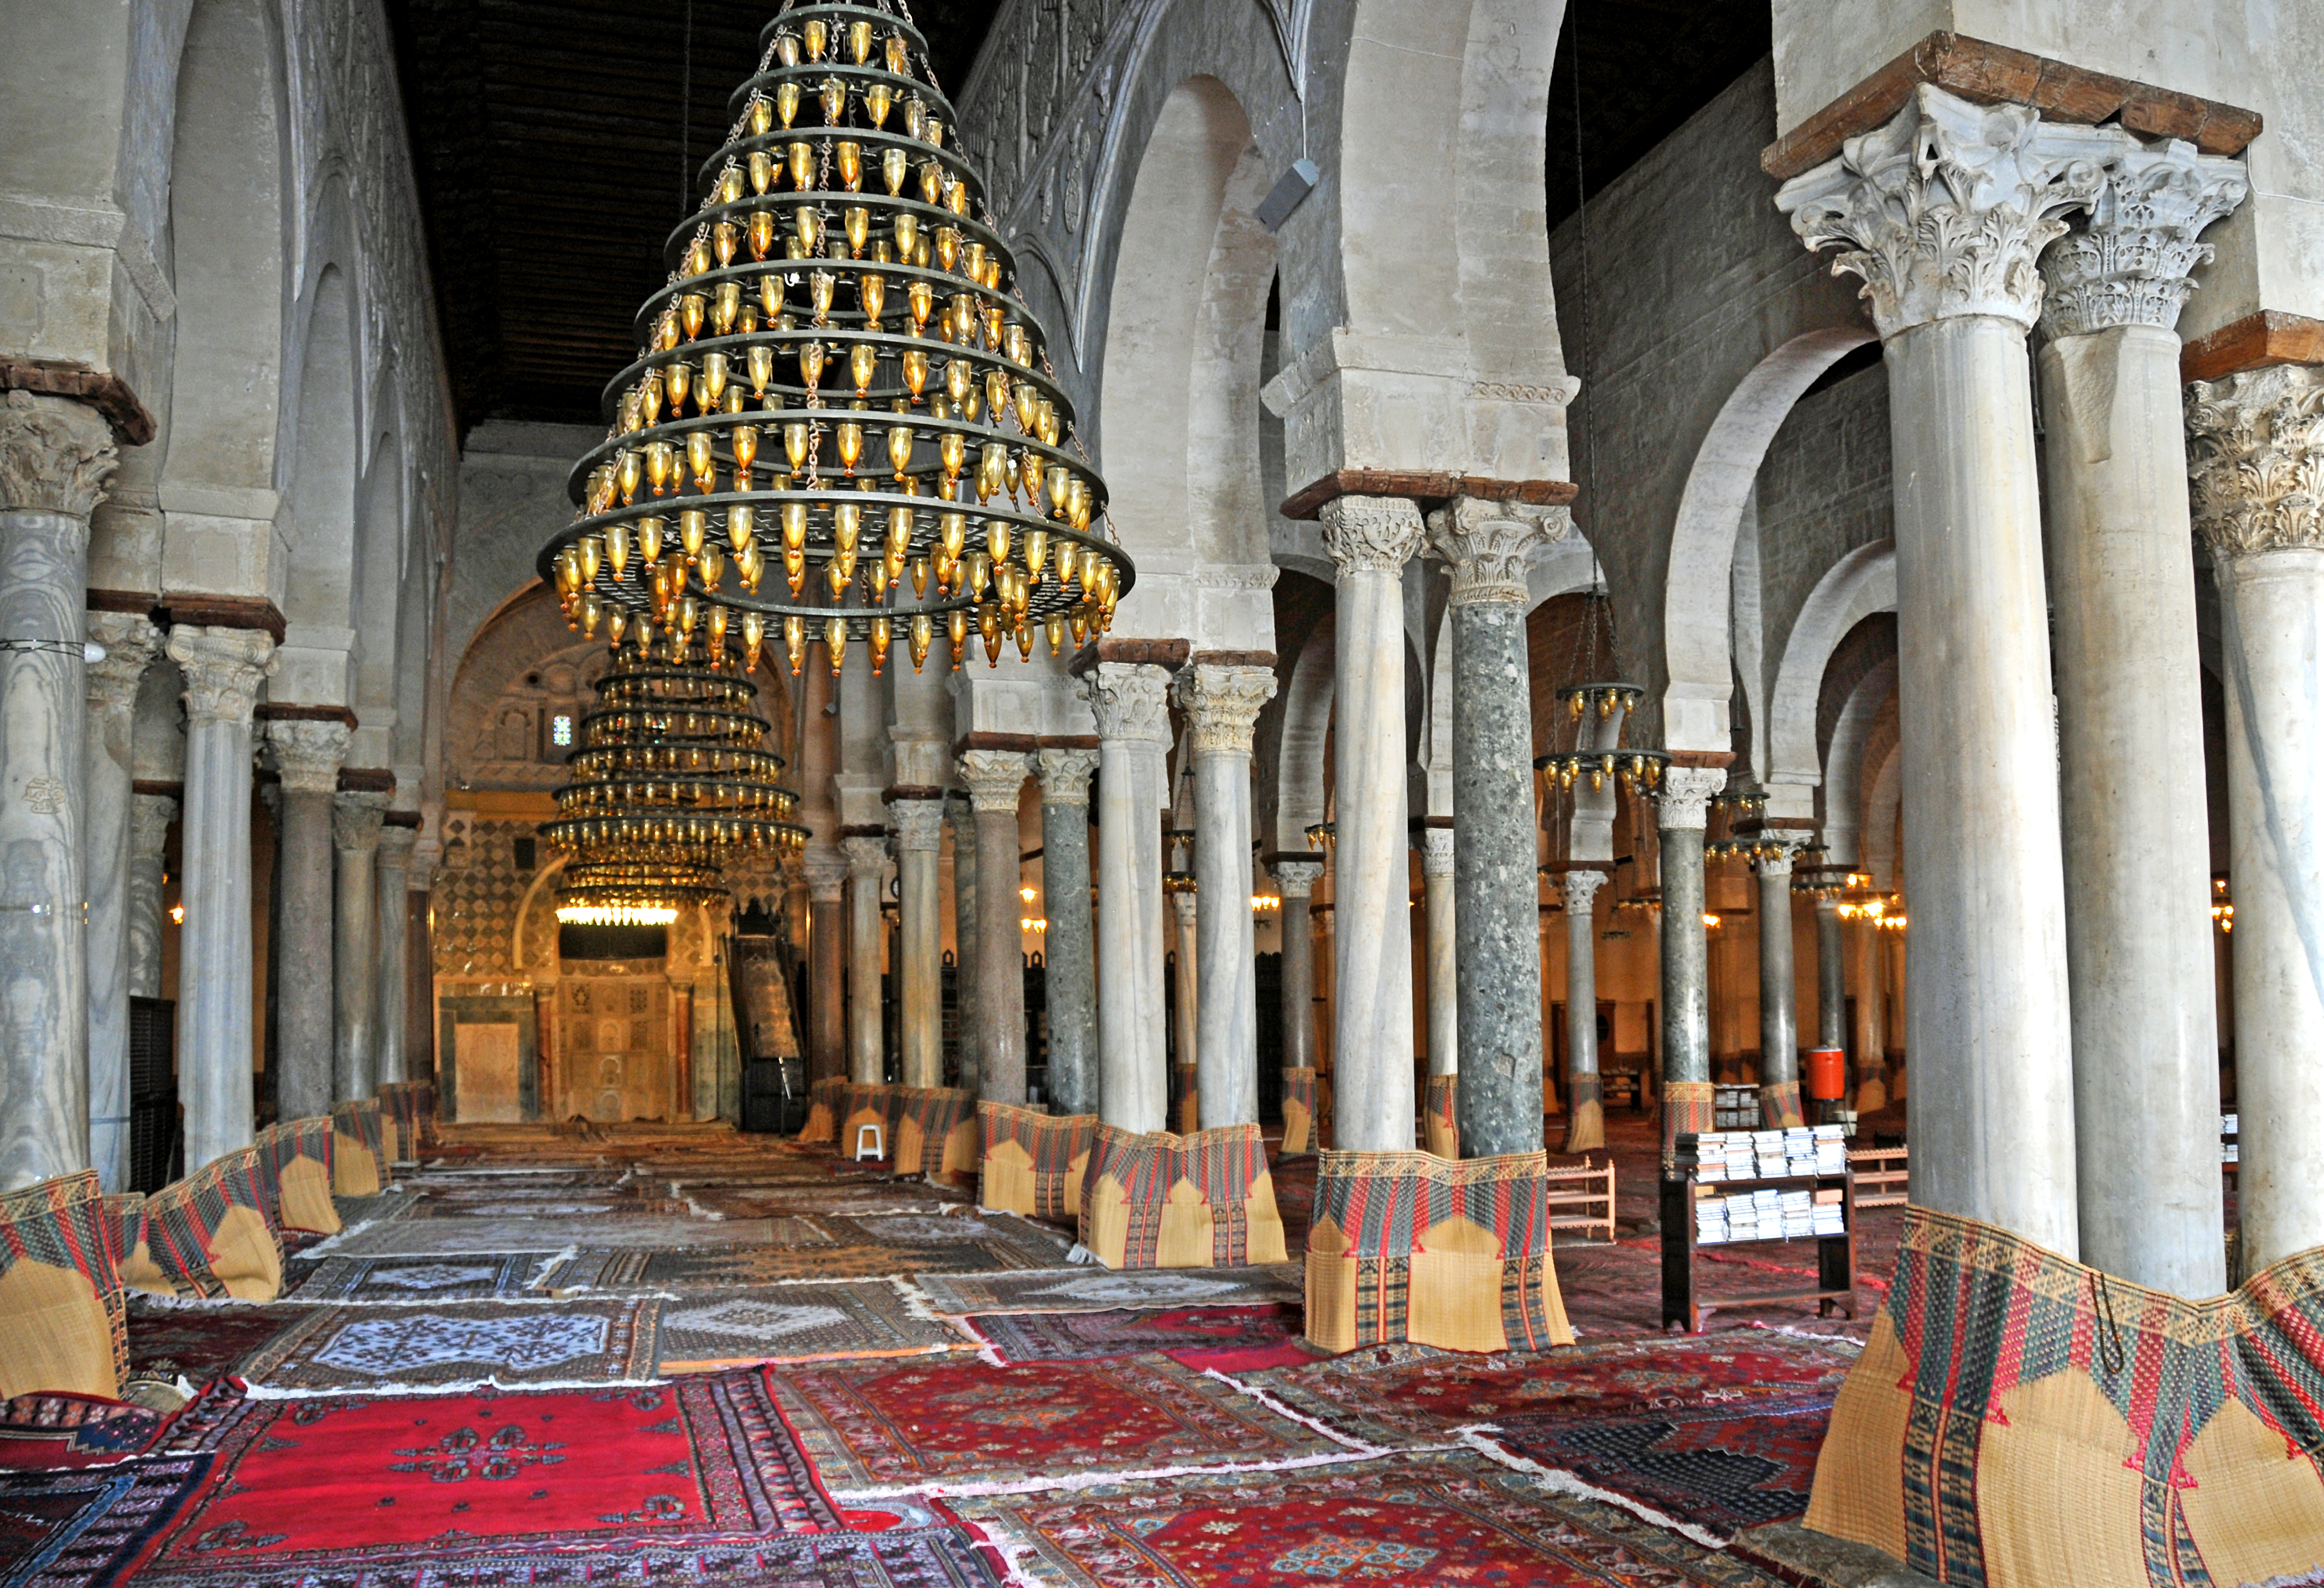 Kairouan Mosque Wiki Great Mosque of Kairouan